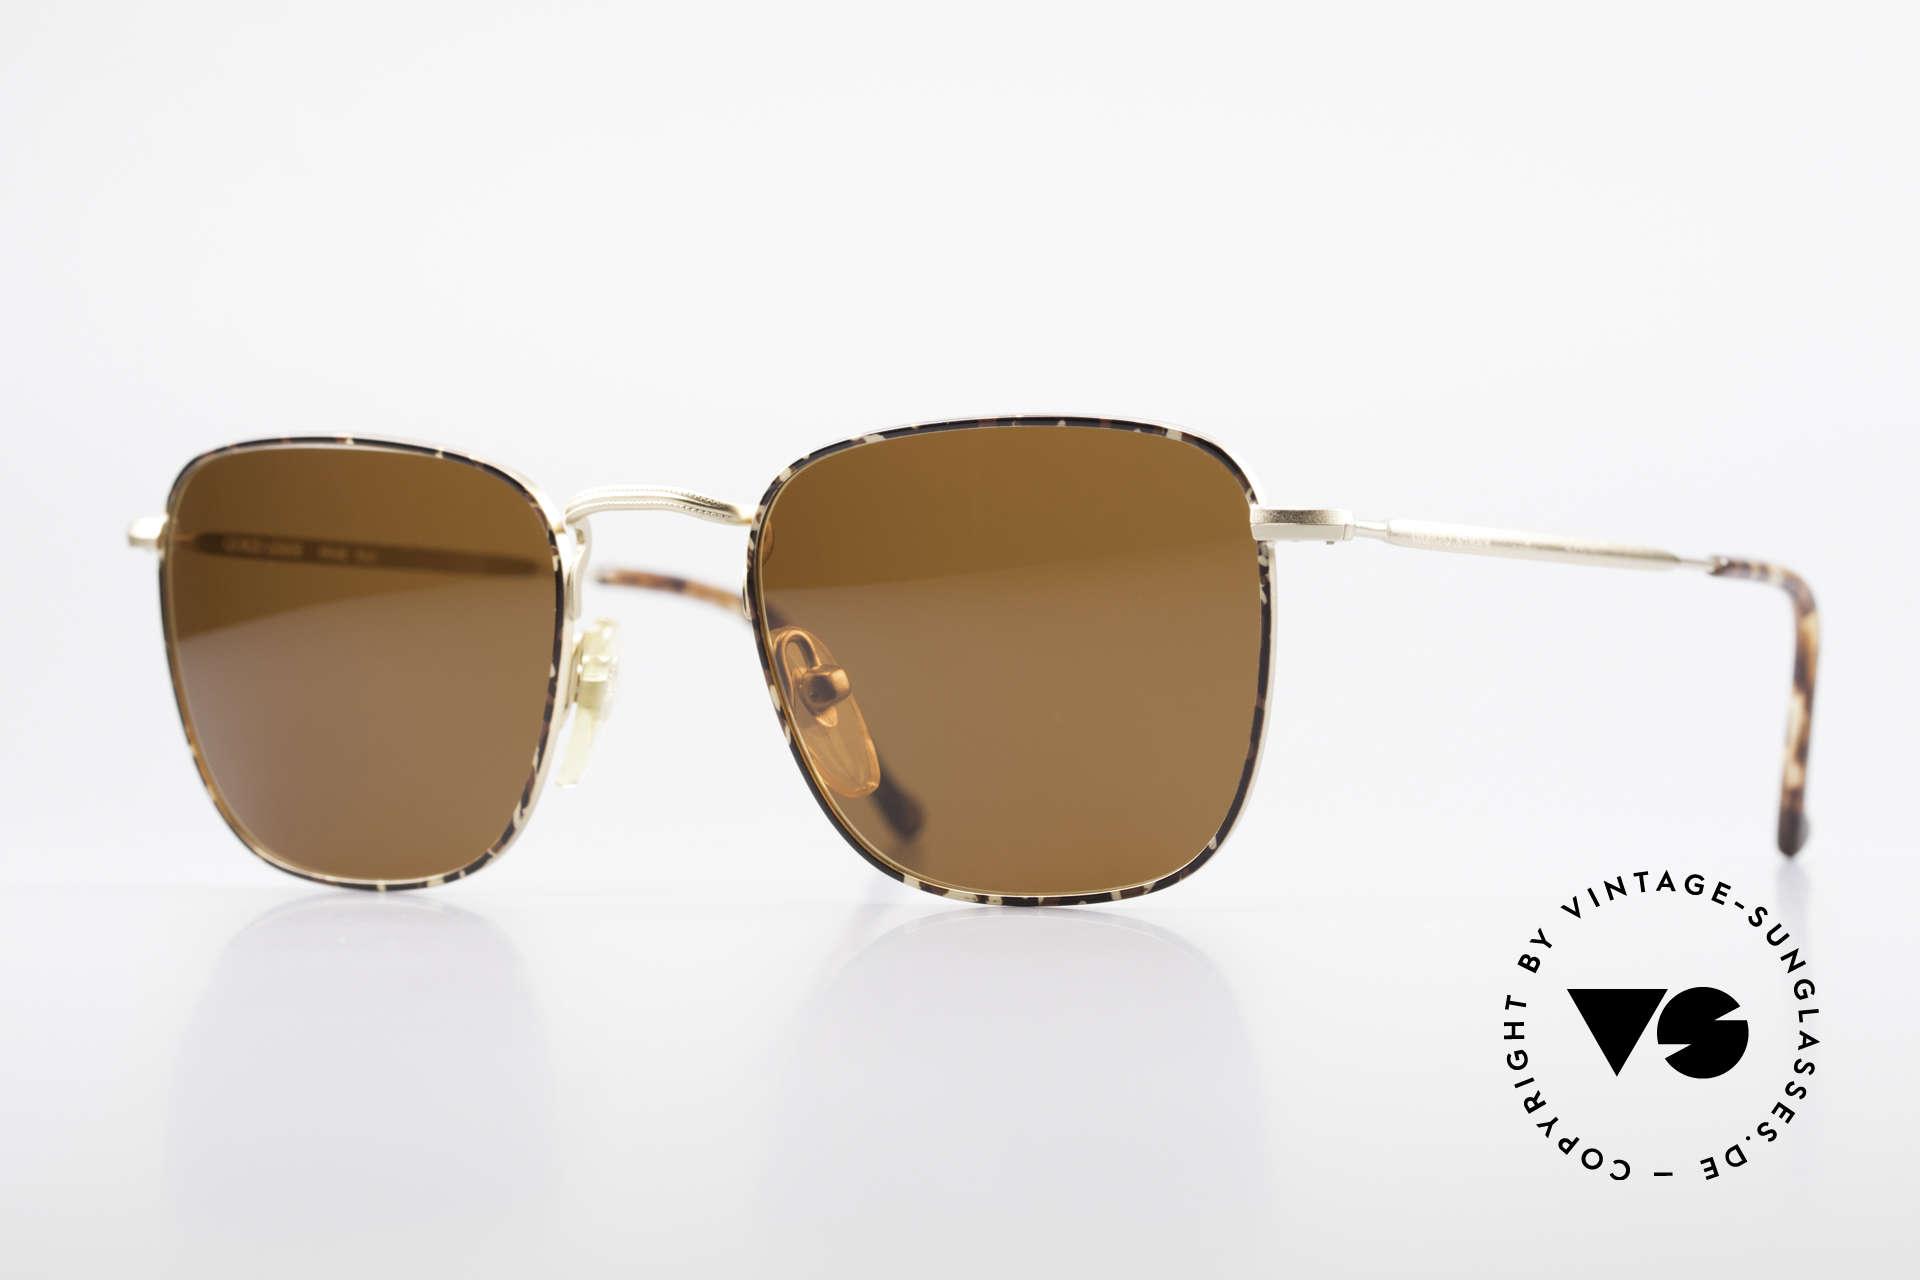 Giorgio Armani 137 Square Panto Vintage Shades, timeless vintage Giorgio Armani designer sunglasses, Made for Men